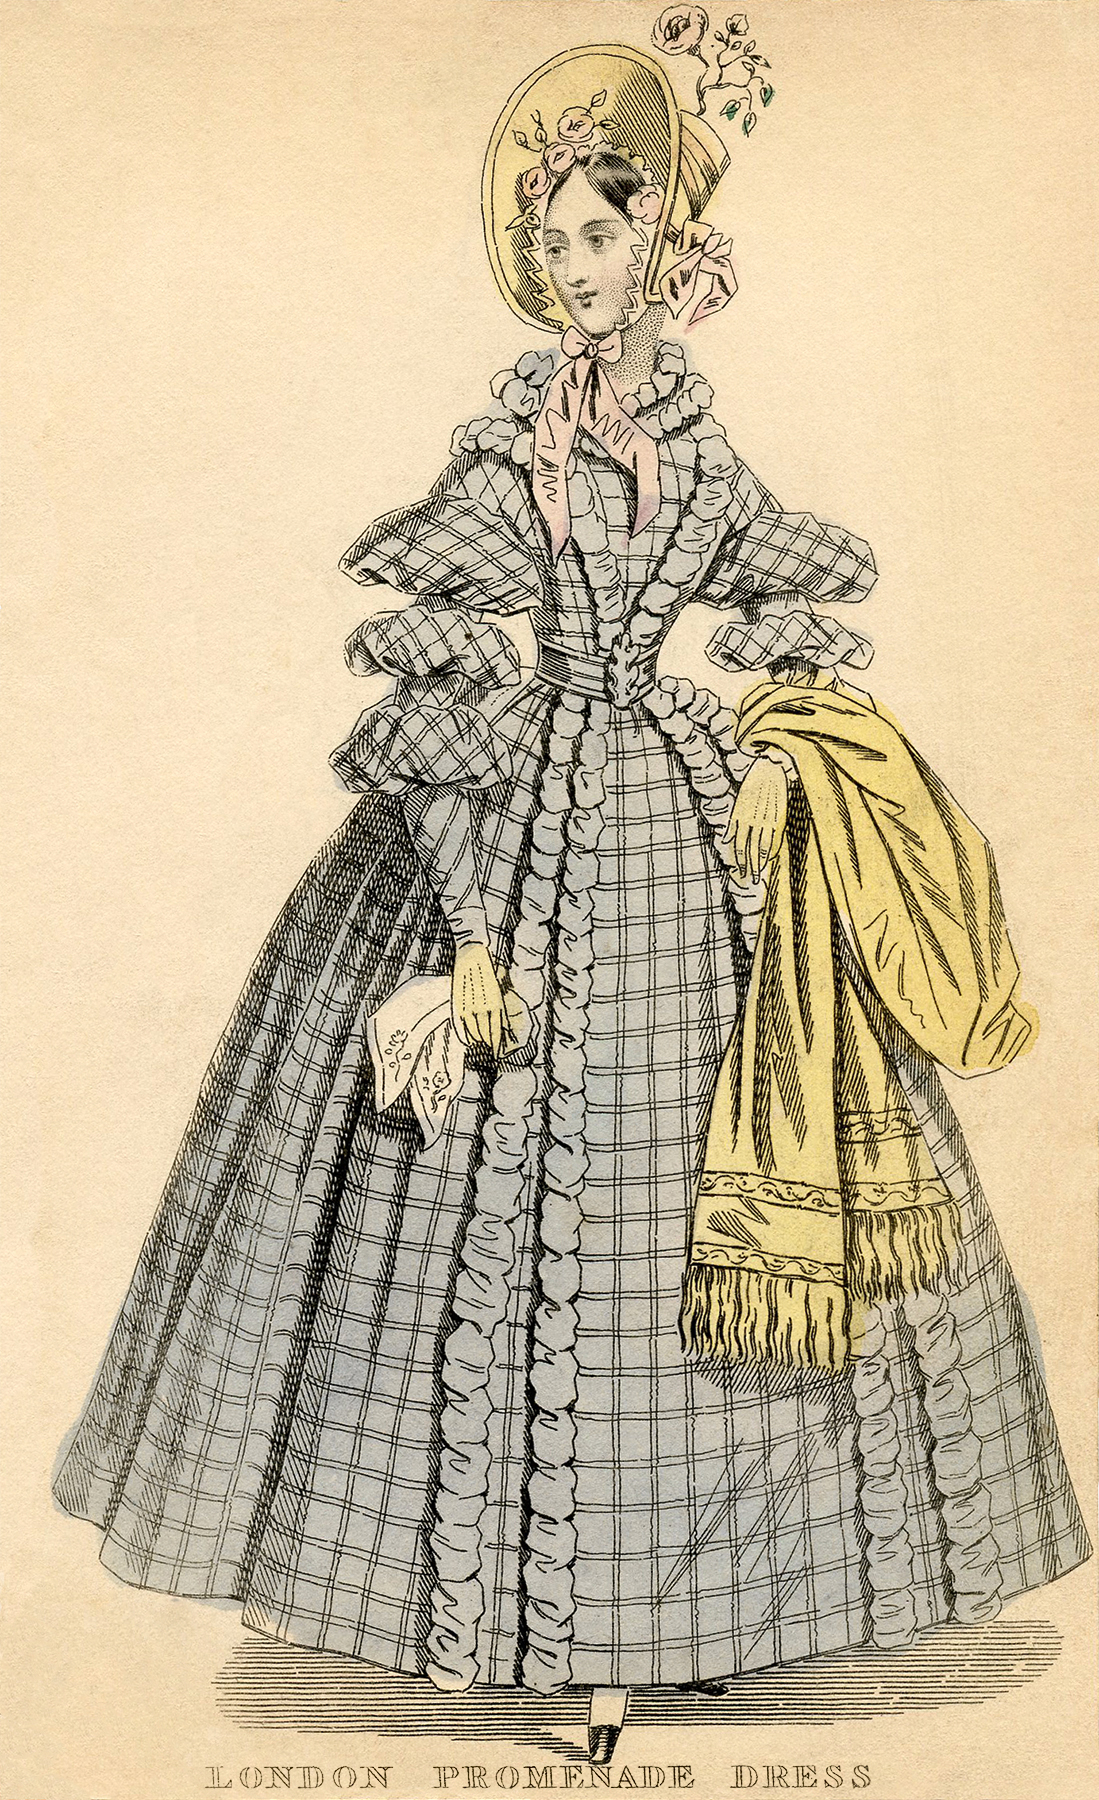 Free Antique Fashion Image London